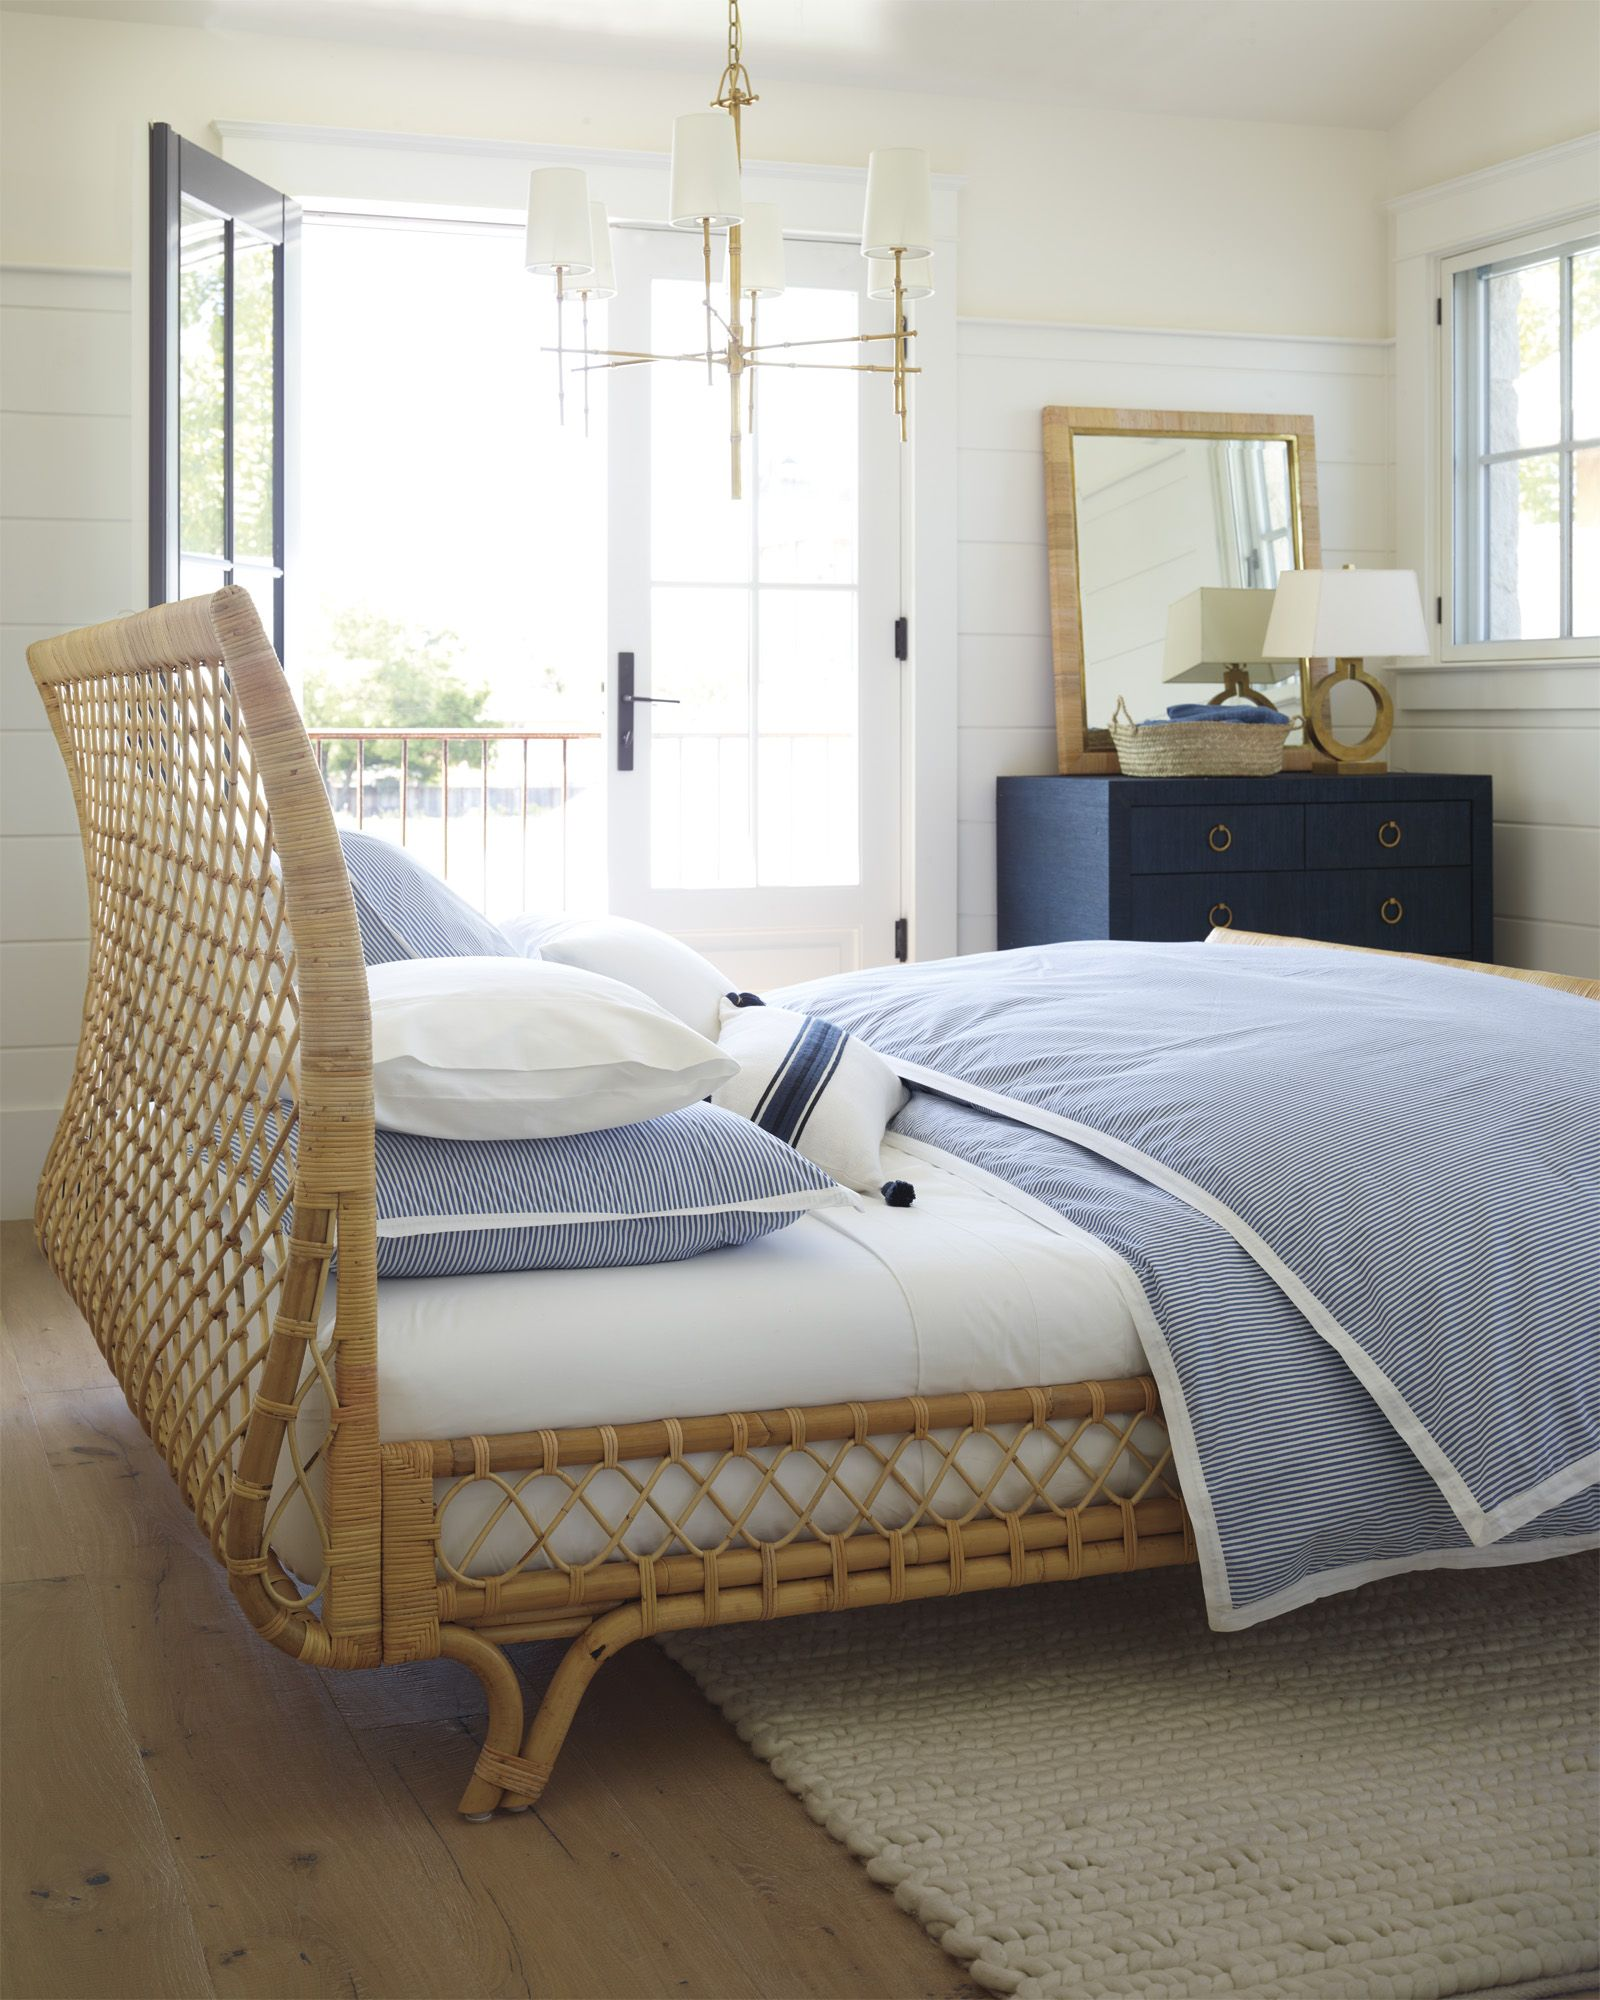 20 Bedroom Chandelier Designs Decorating Ideas: Atwell ChandelierAtwell Chandelier